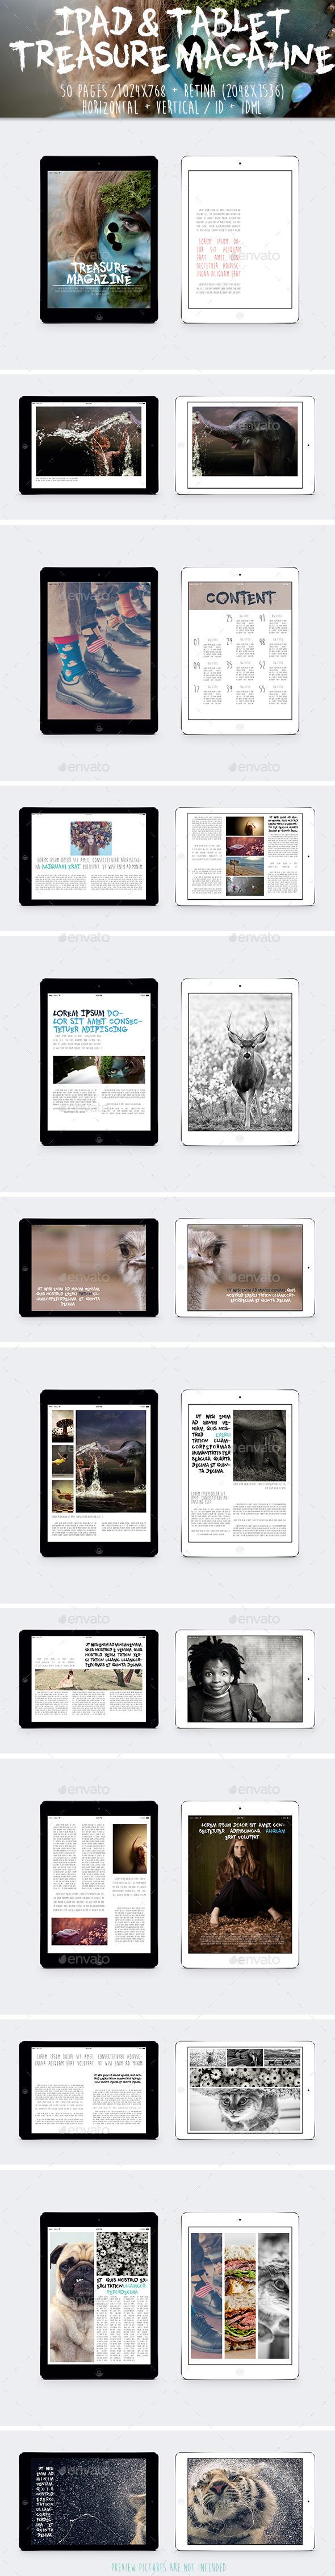 Ipad & Tablet Treasure Magazine - Digital Magazines ePublishing